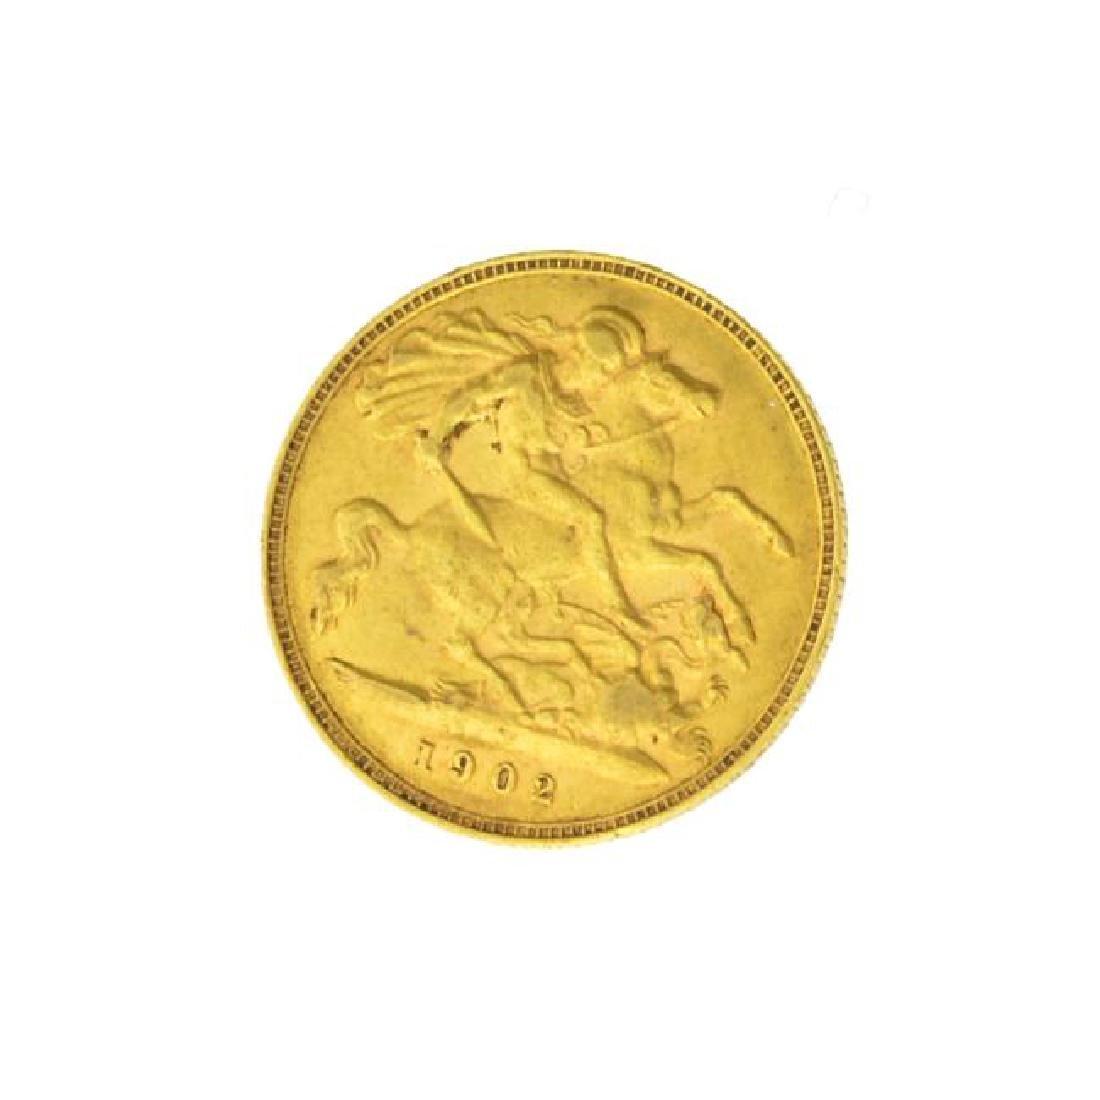 1902 British Half Sovereign Gold Coin (JG) - 2